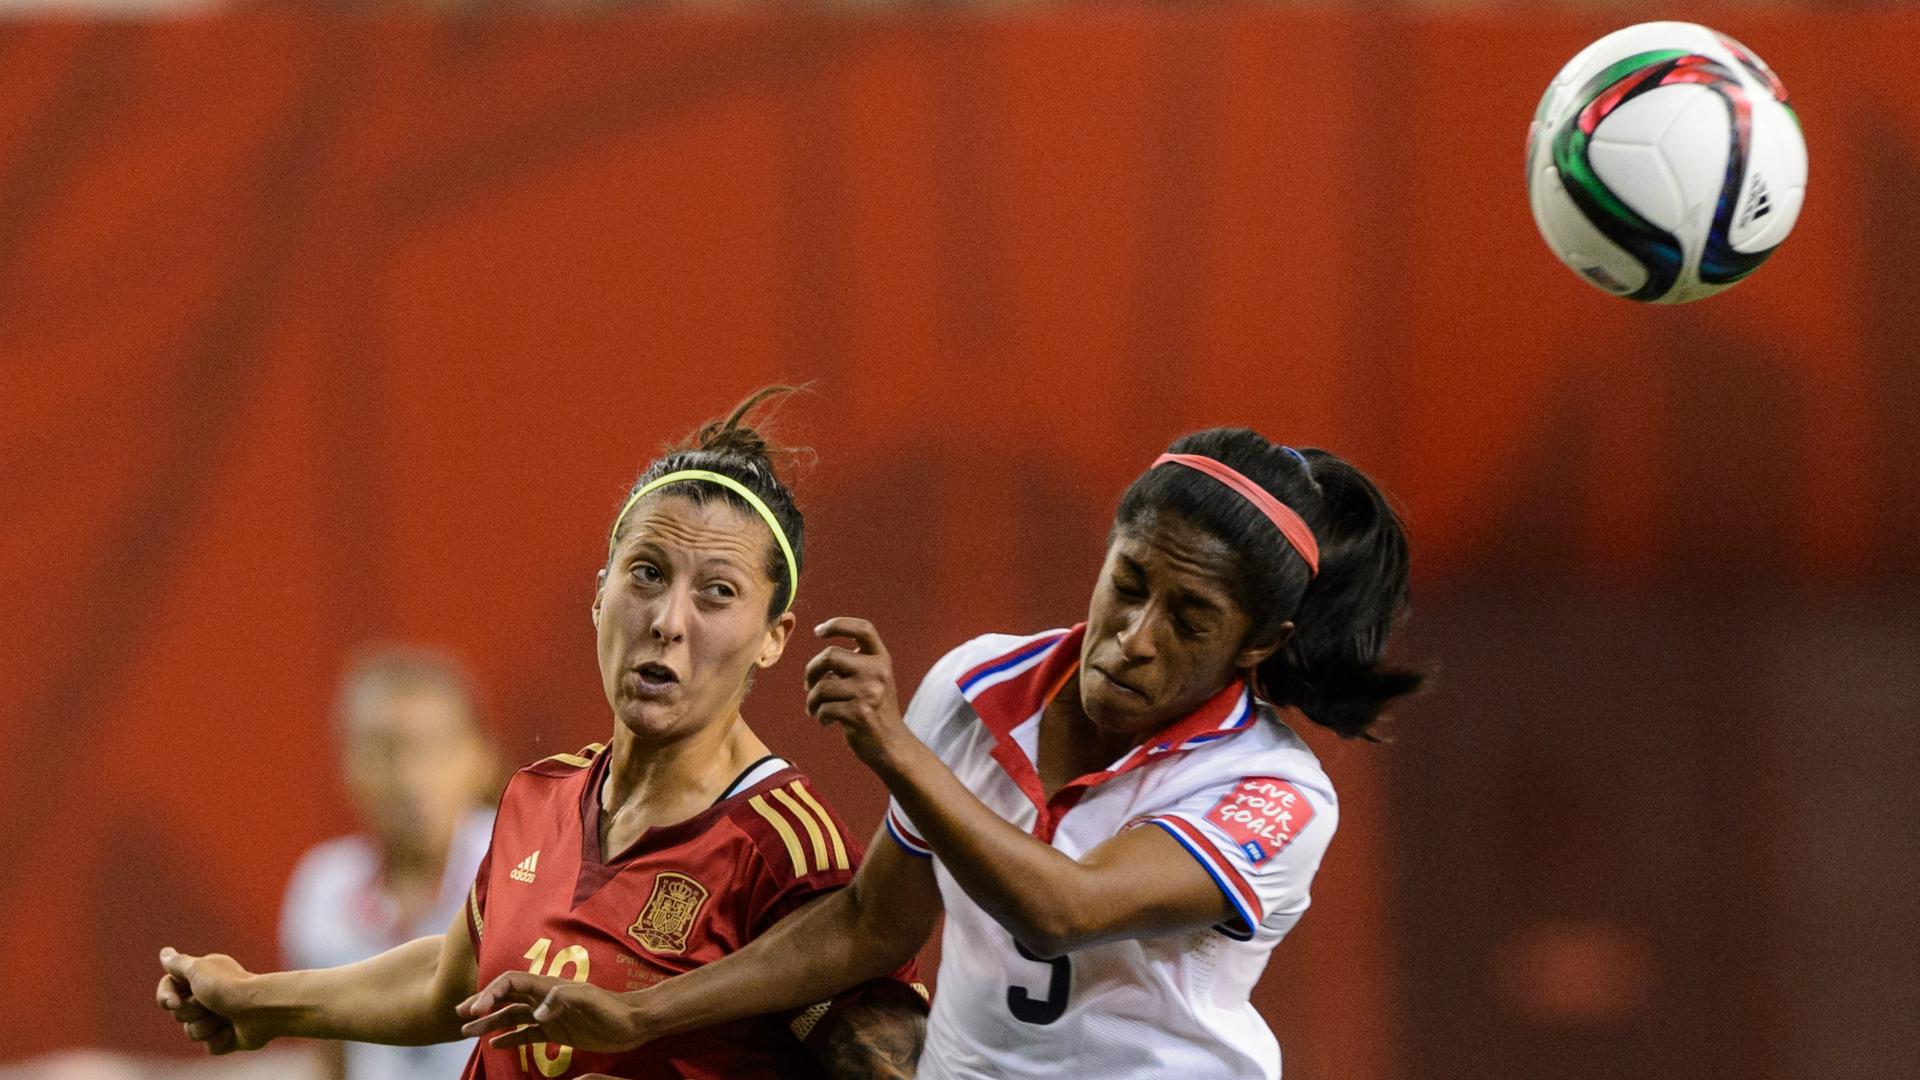 Jenifer Hermoso Diana Saenz Spain Costa Rica Women World Cup 06092015